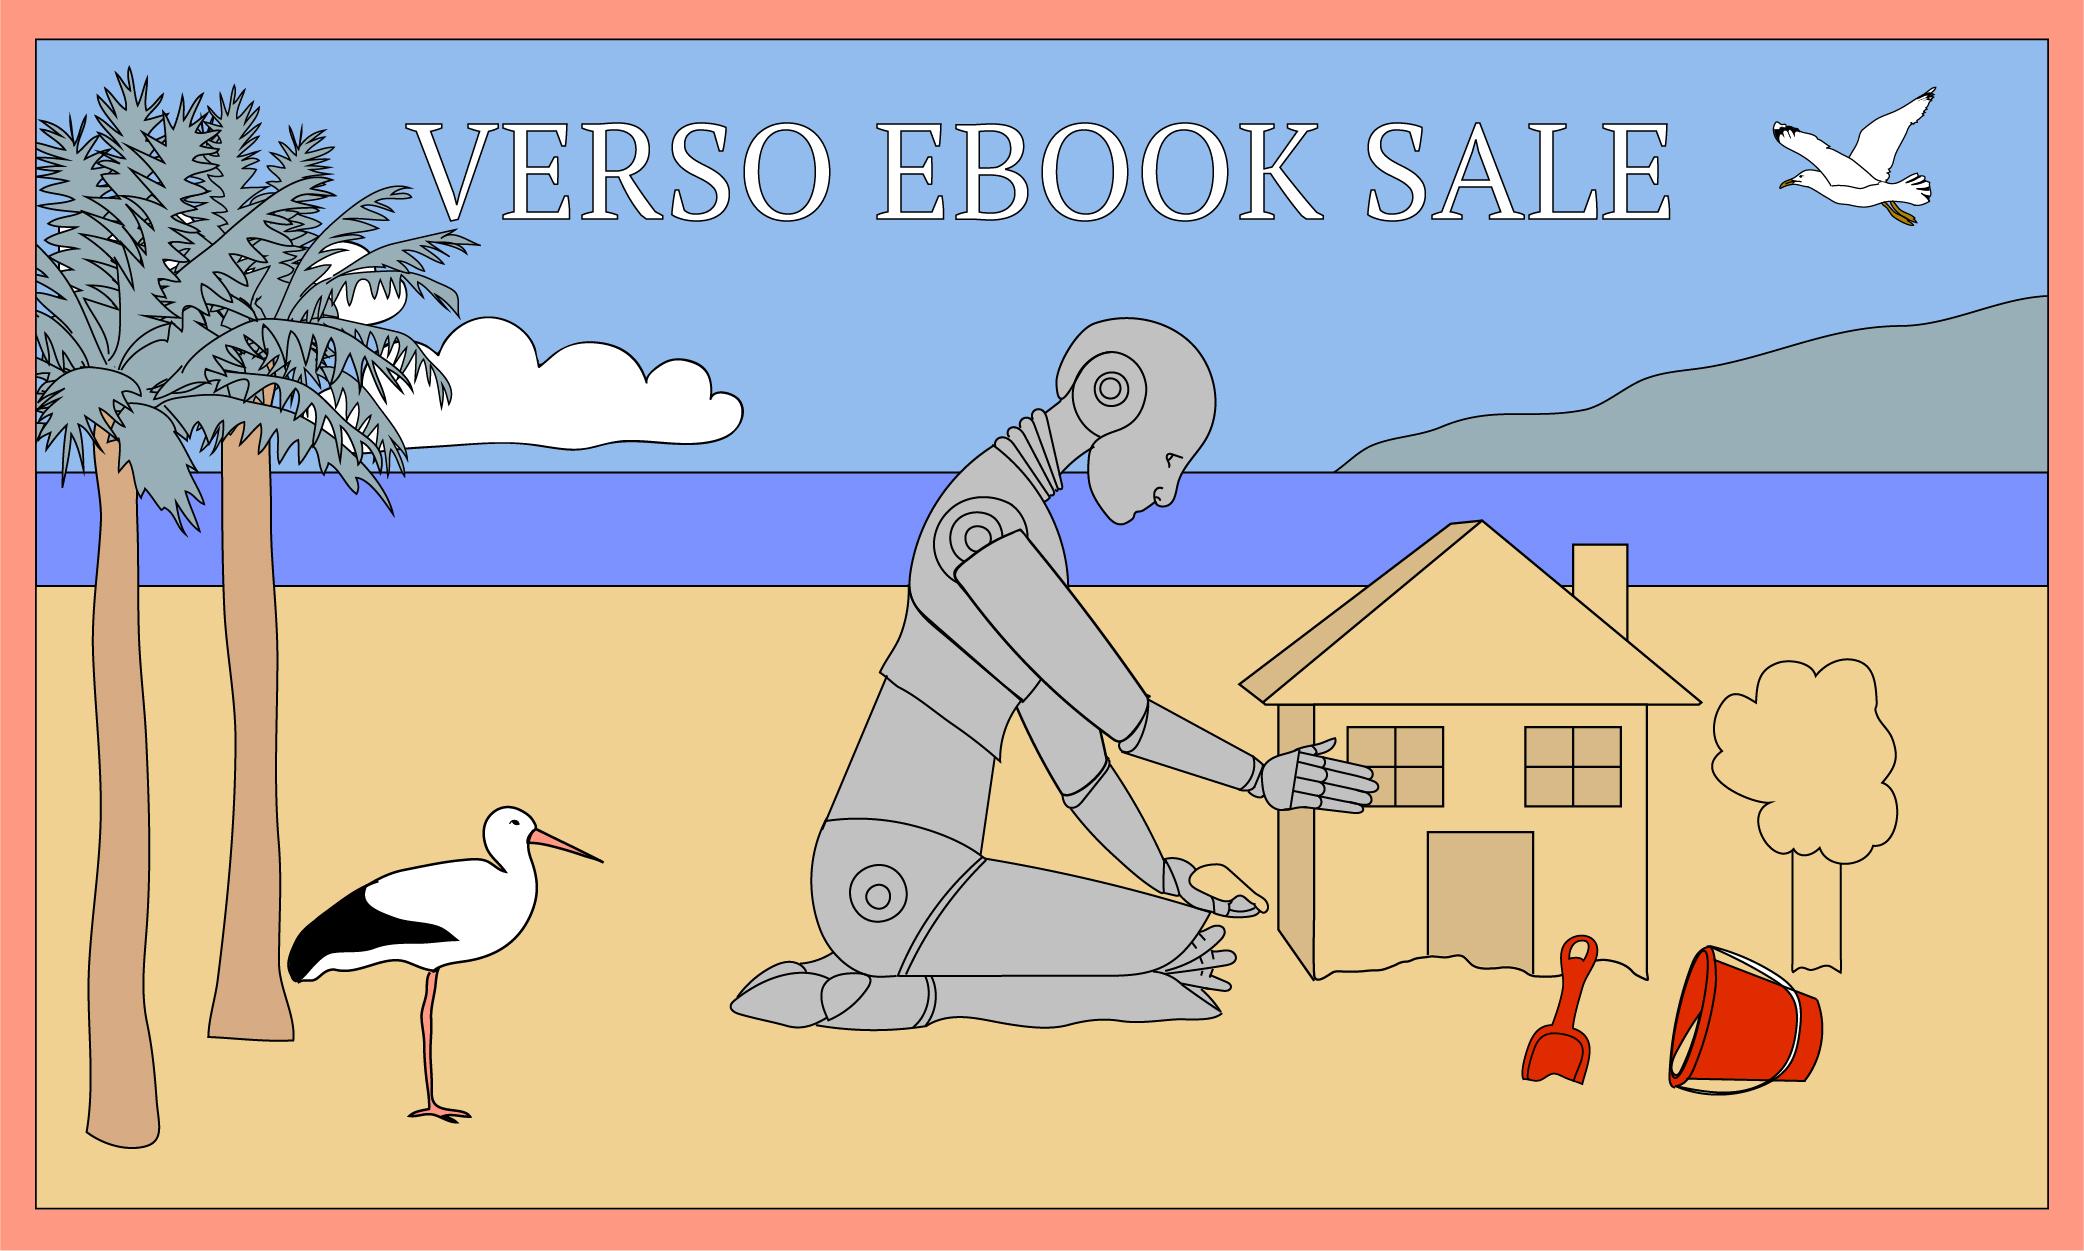 Verso_ebook_sale_2019-500x300px-